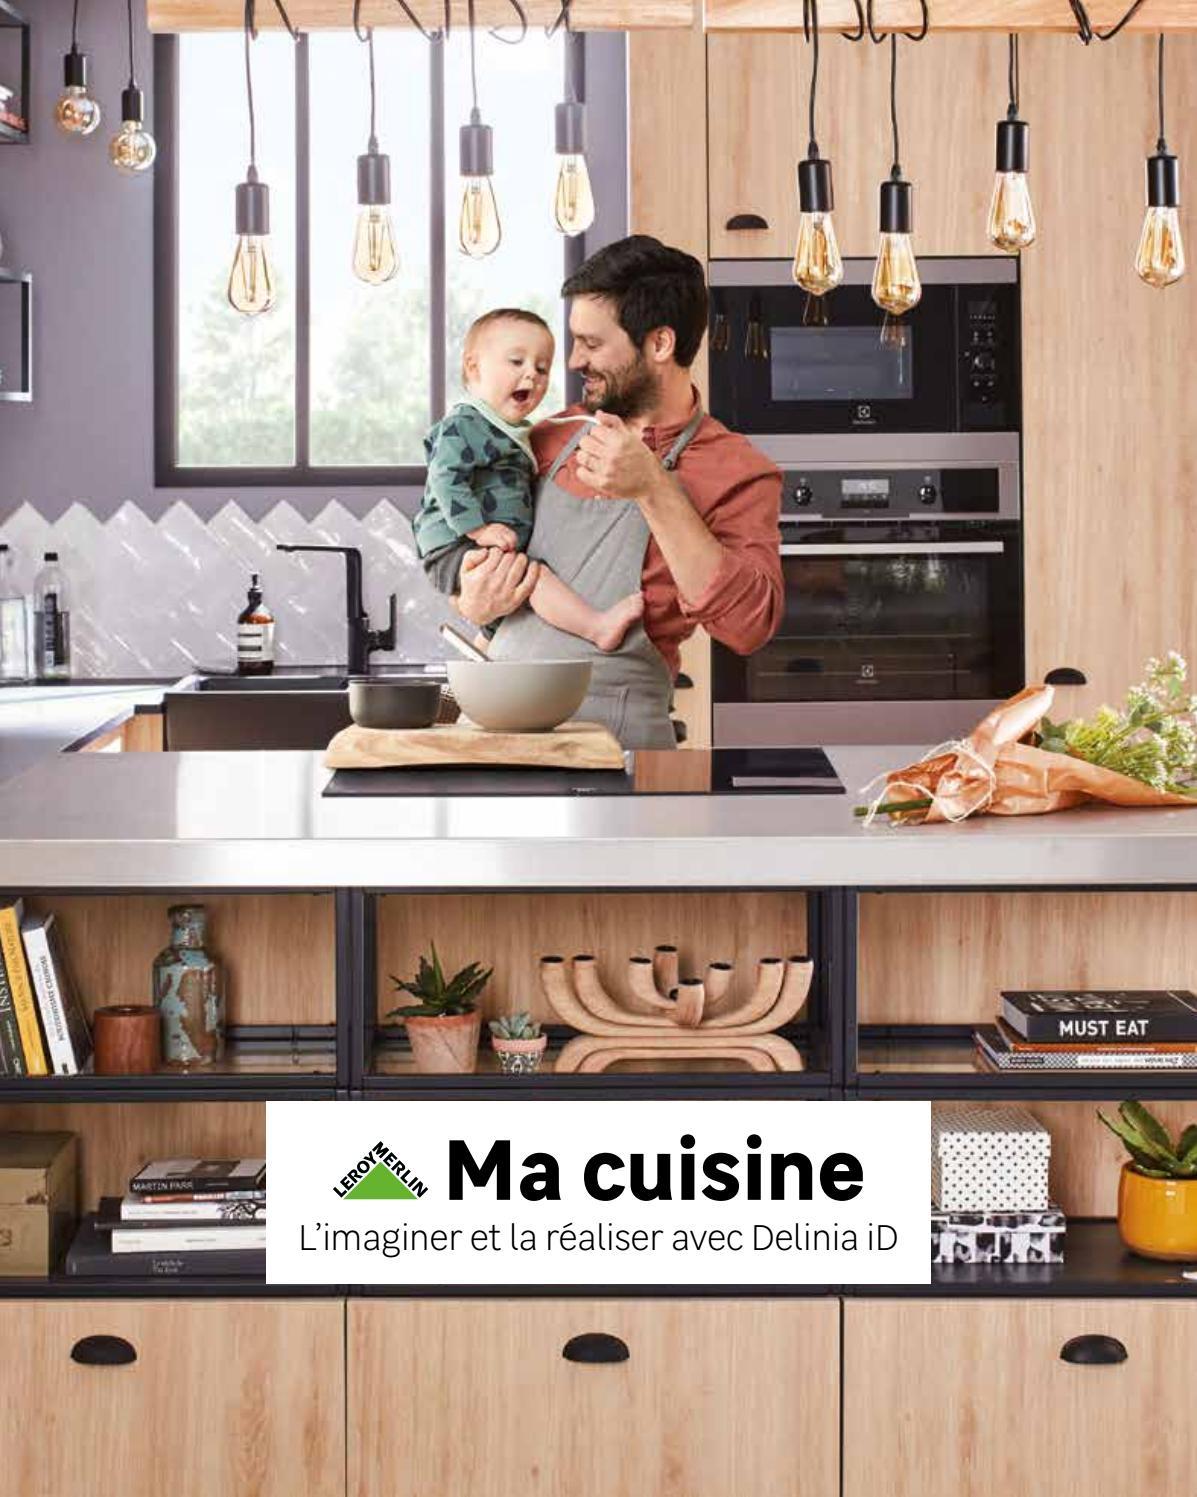 leroy merlin ma cuisine le guide by